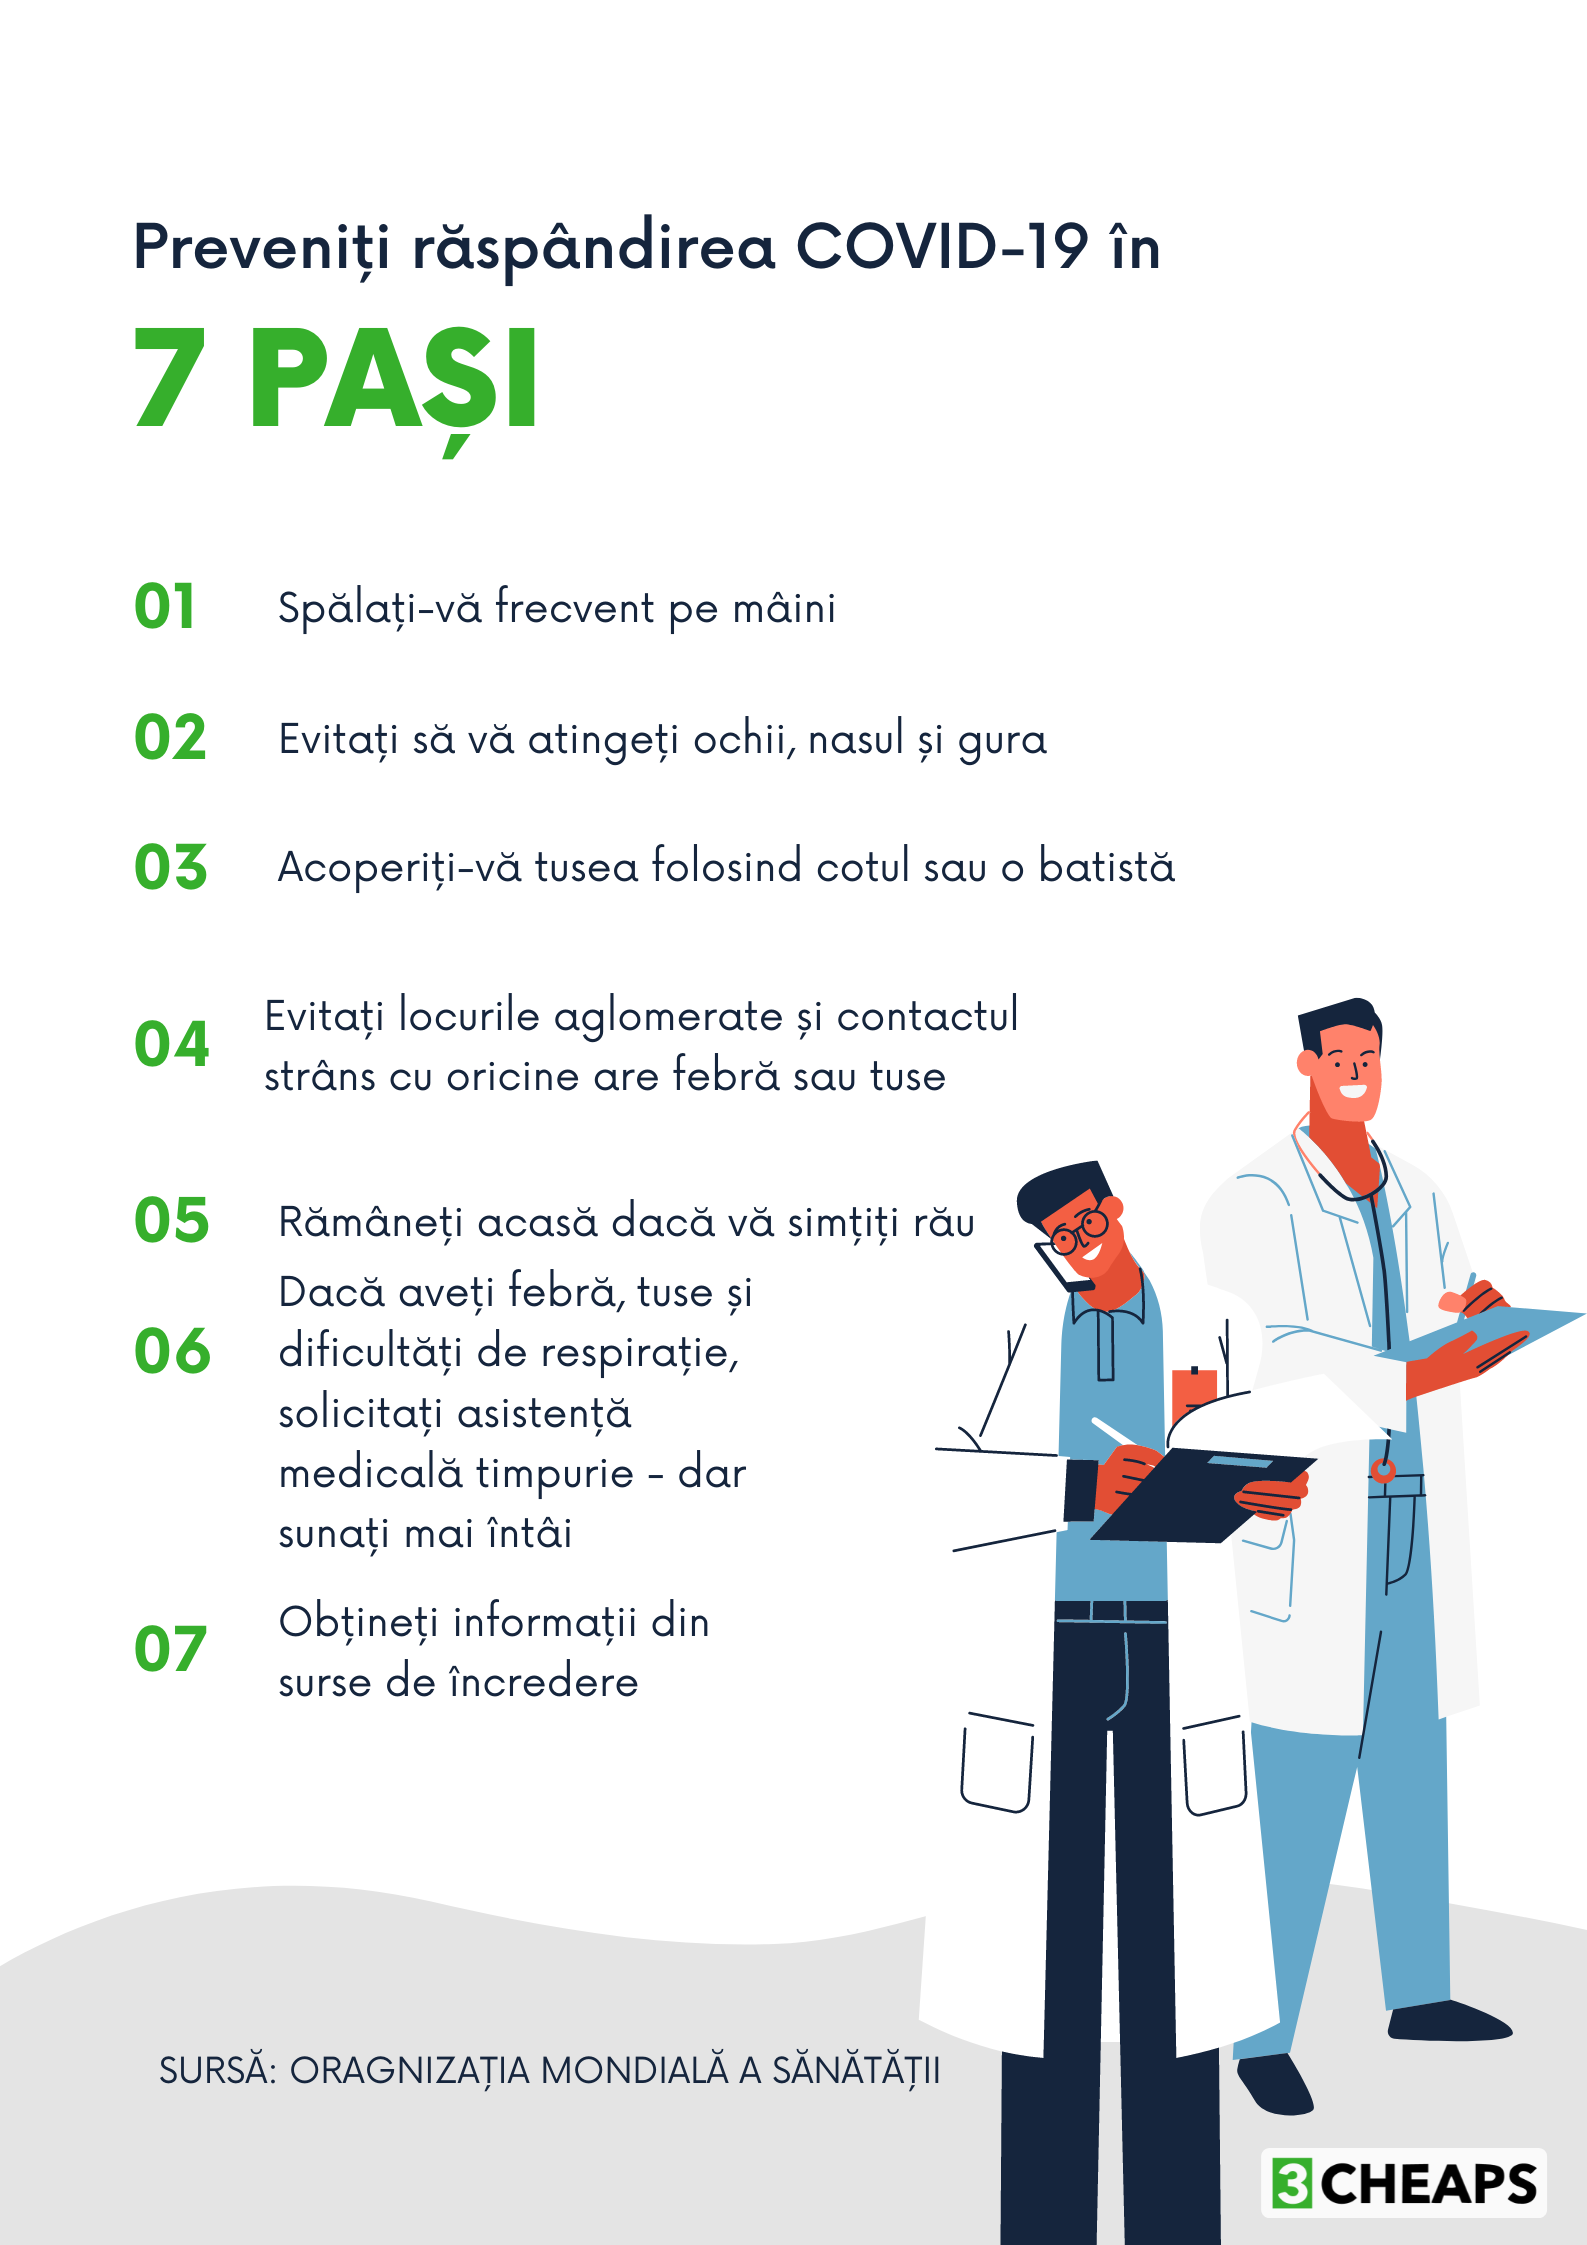 https://images.3cheaps.com/blog/test-rapid-covid/7-pasi-prevenire-raspandire-Coronavirus-poster